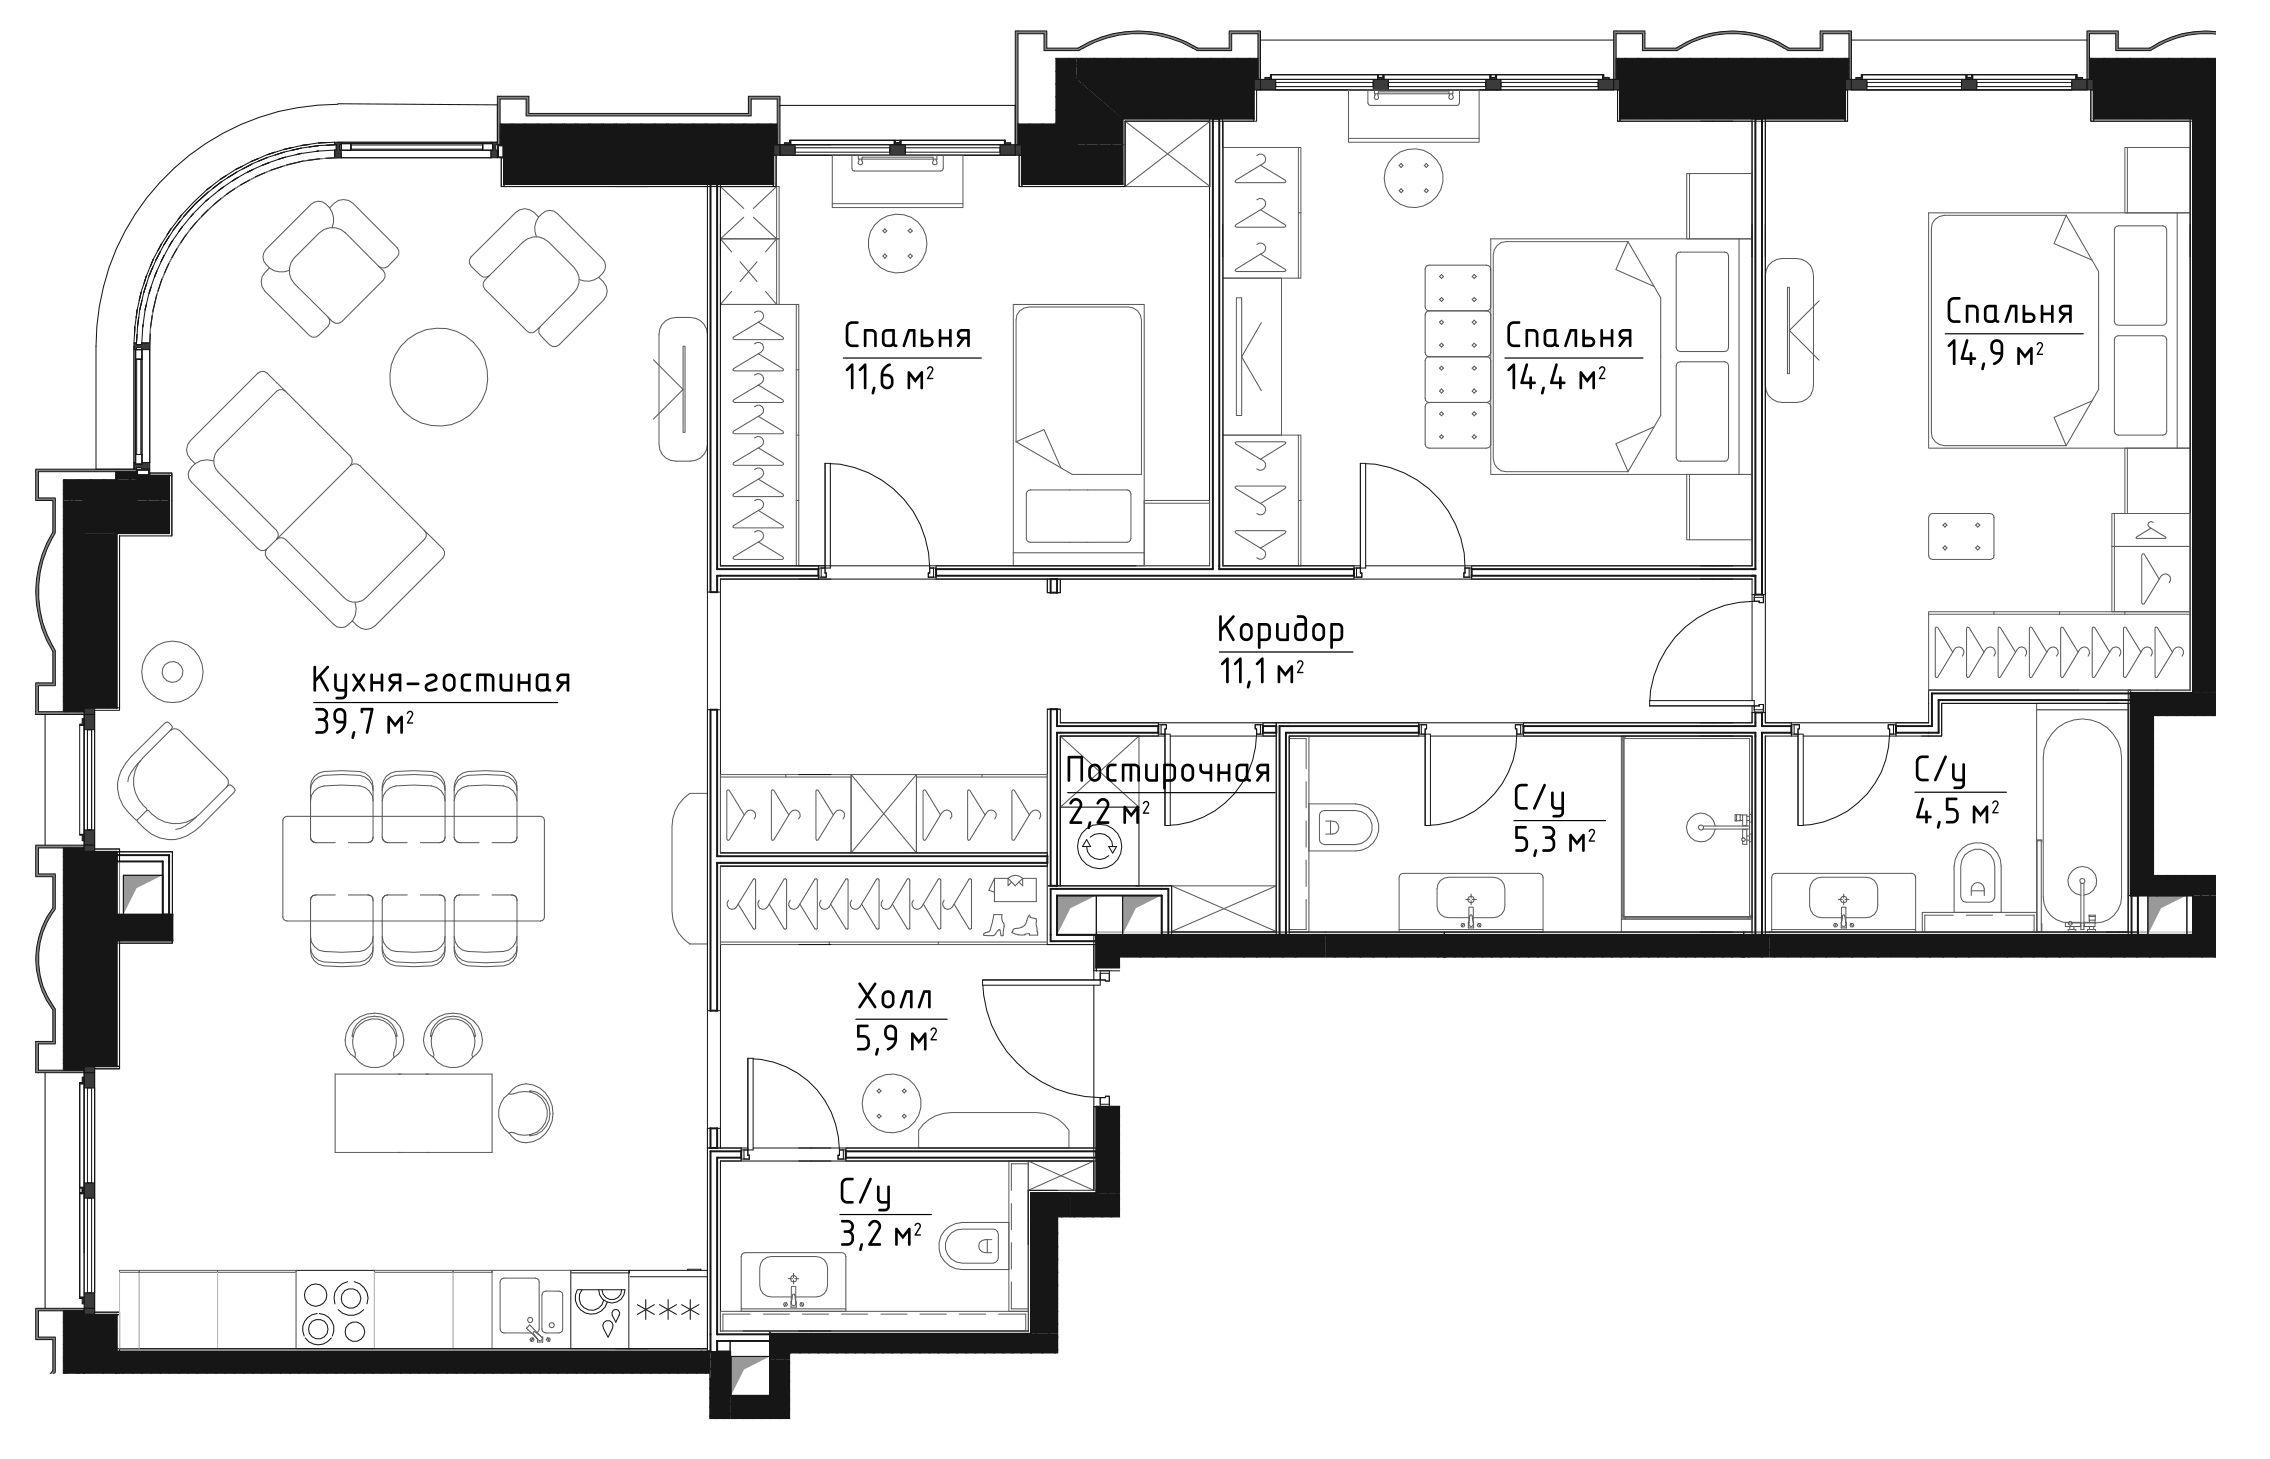 4Е-к.кв, 112.8 м²